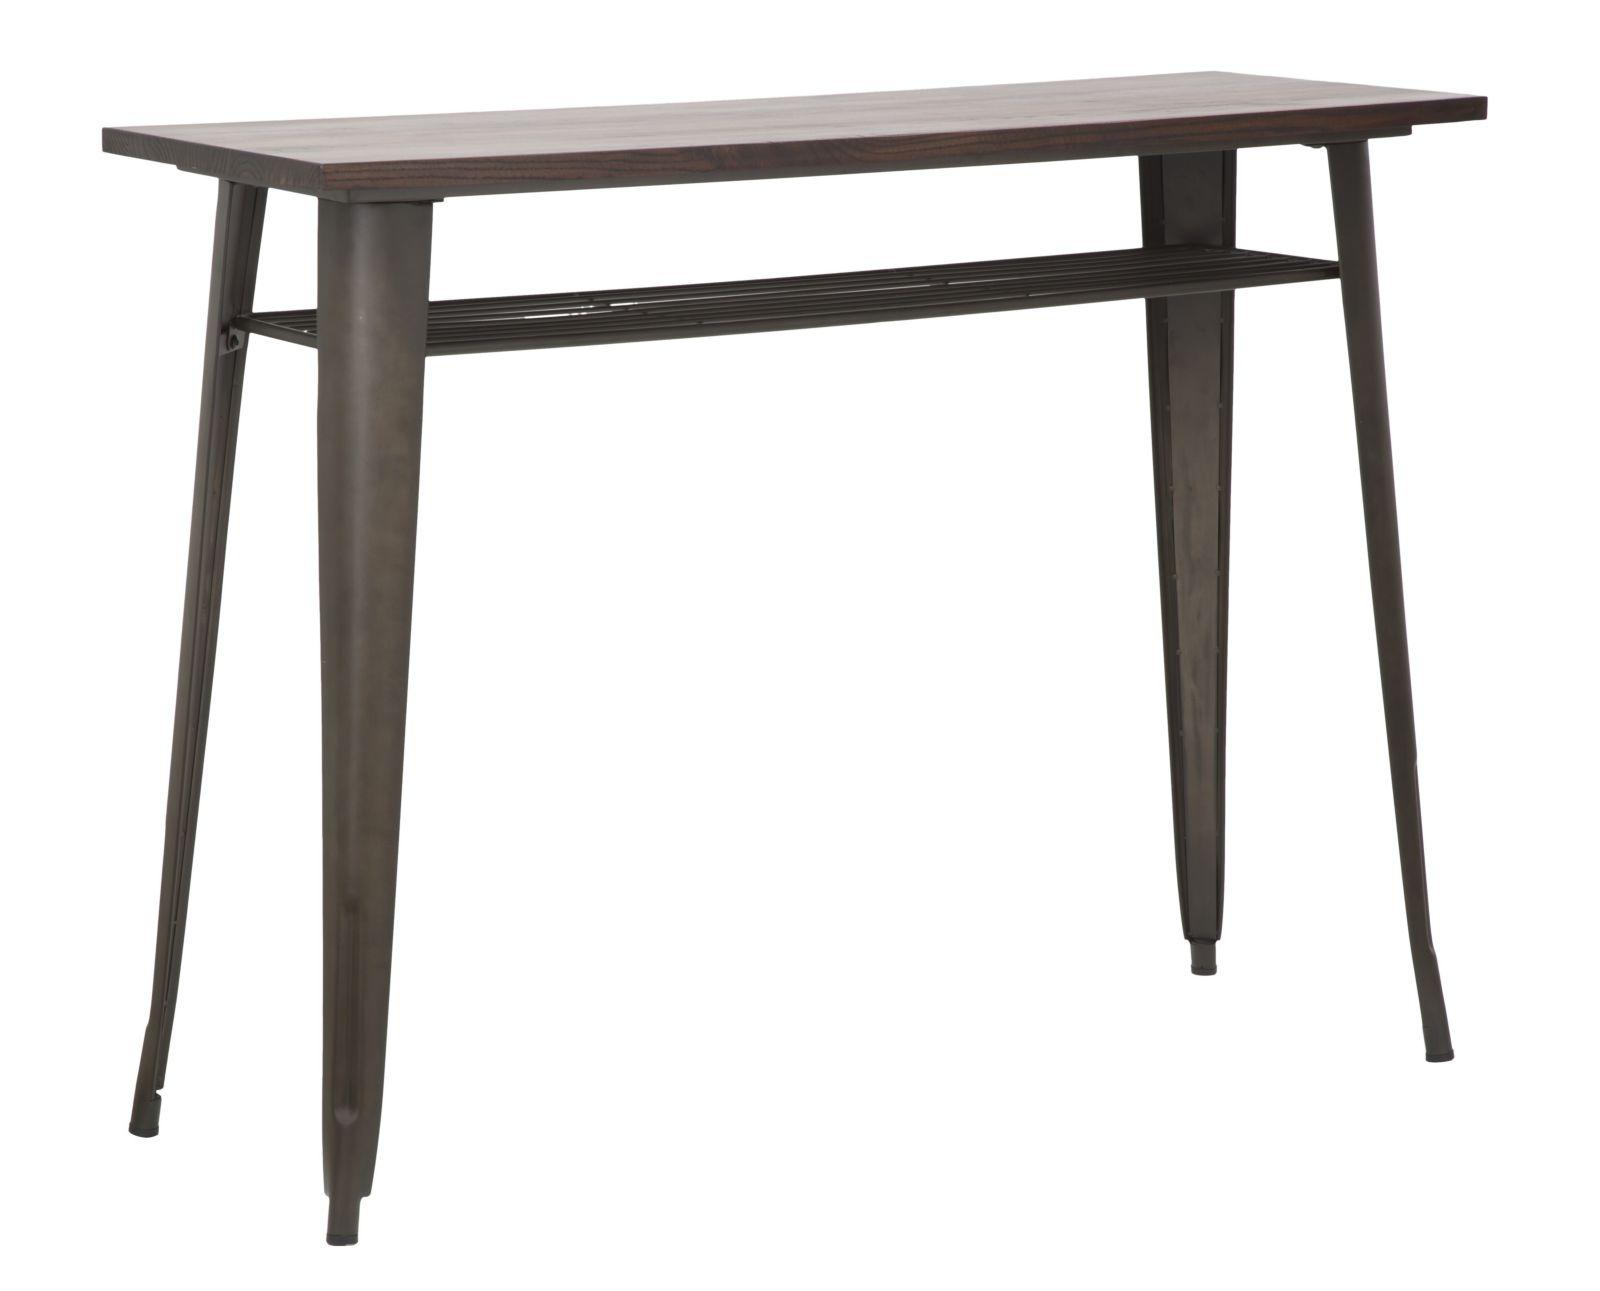 Masa de bar din lemn de ulm si metal Harlem Black, l125xA45xH95 cm